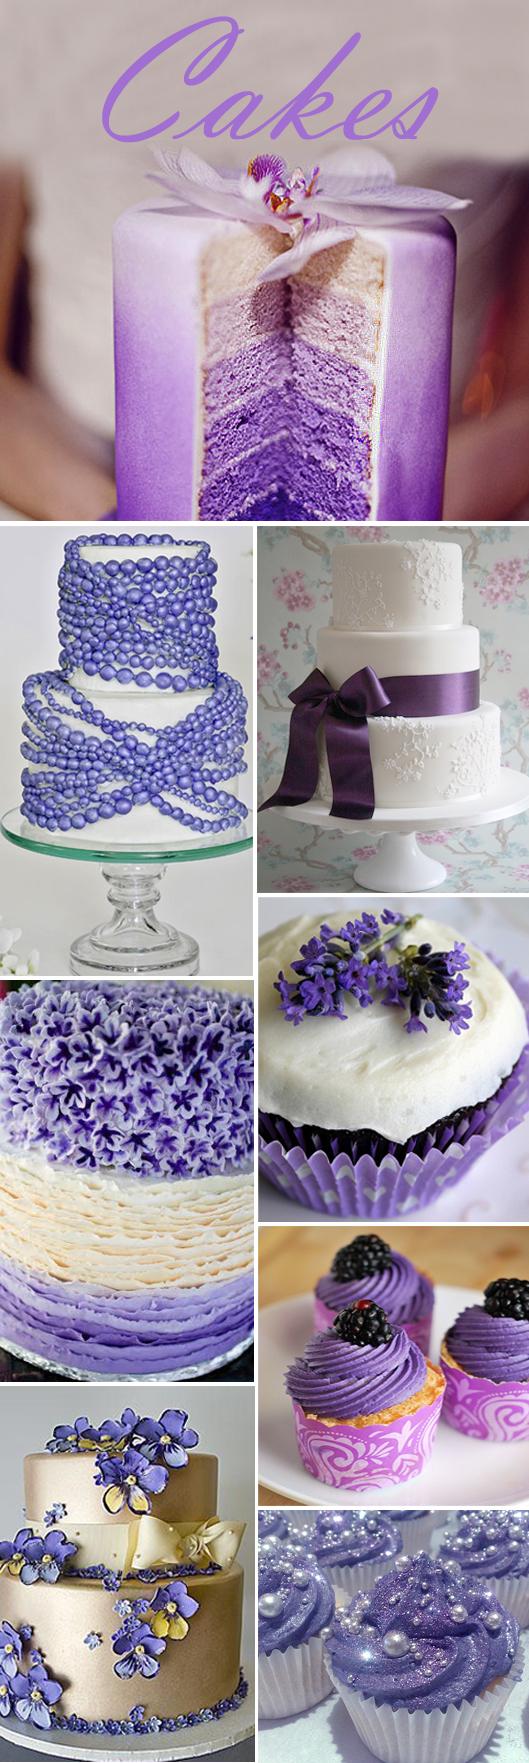 Purple Cake Collage